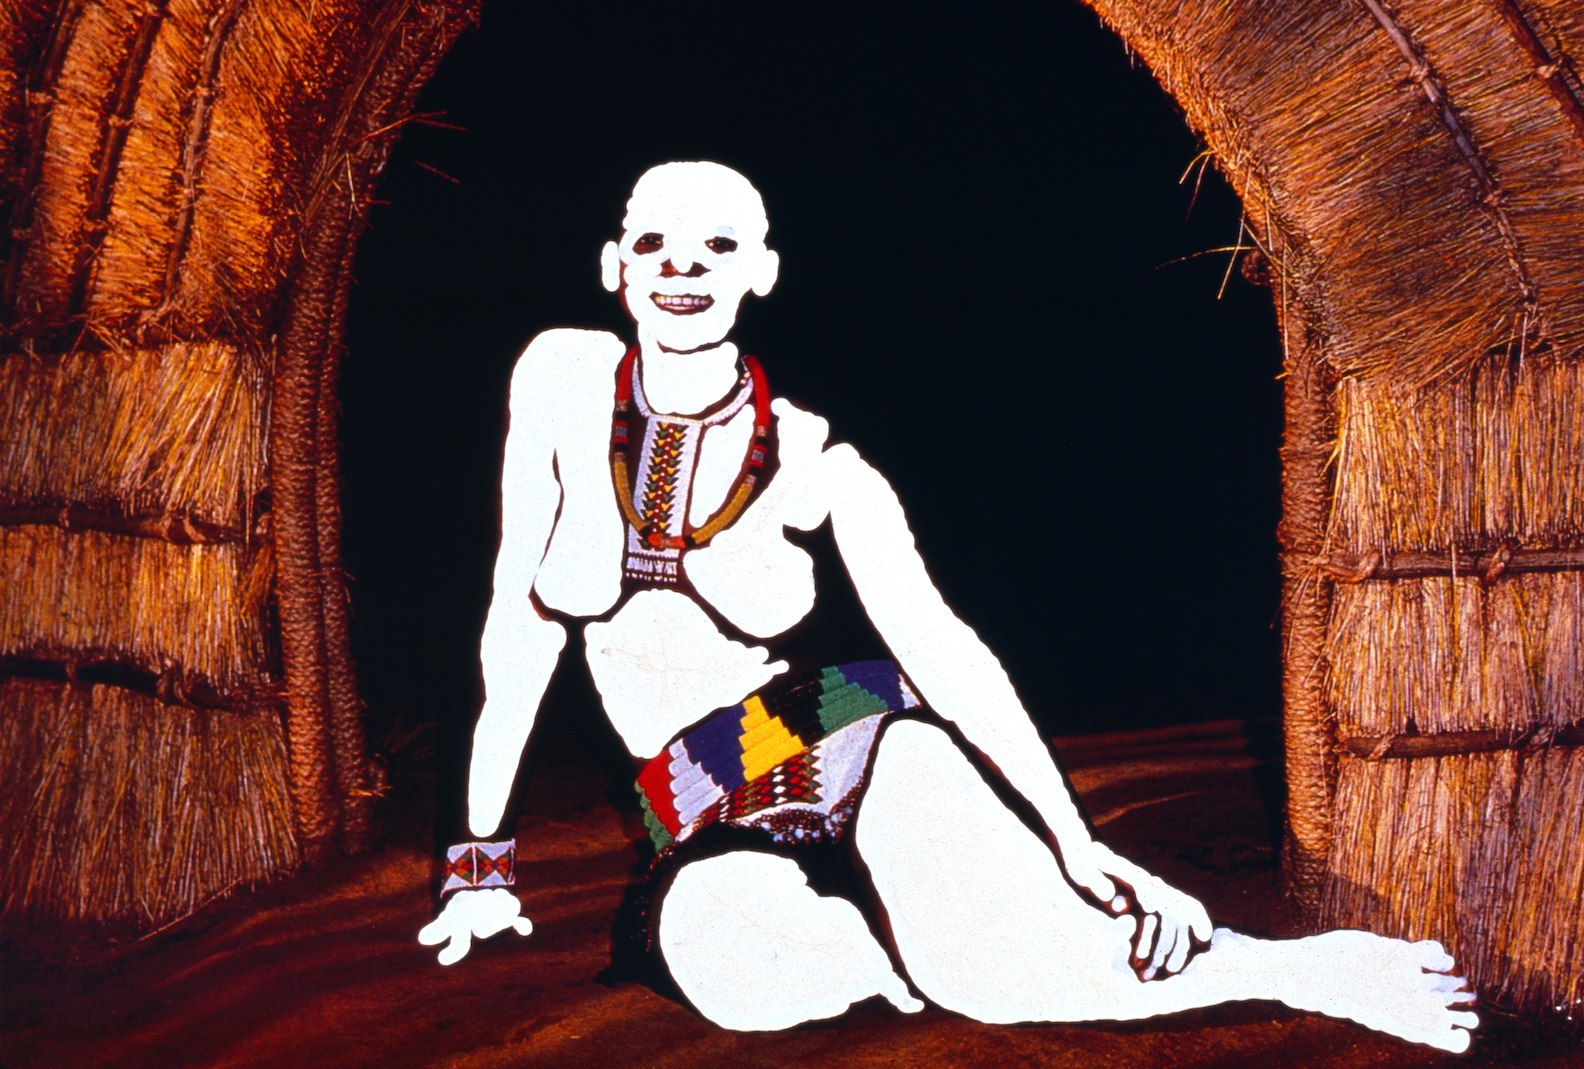 Candice Breitz. Ghost Series #9, 1994–1996. Series: Ghost Series © Candice Breitz. Courtesy of the artist